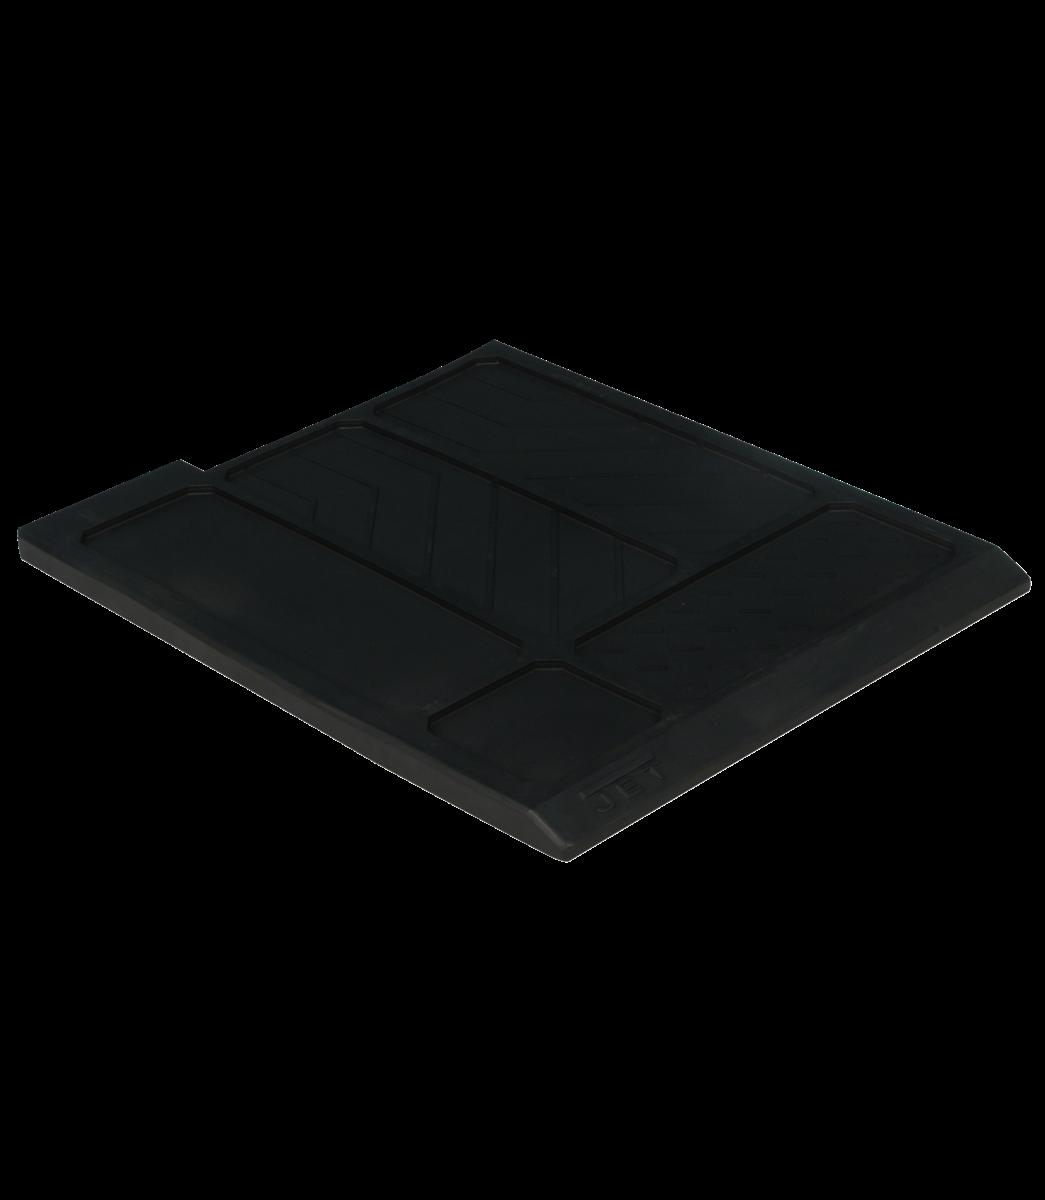 JET — Lathe Mat for GHB 1236